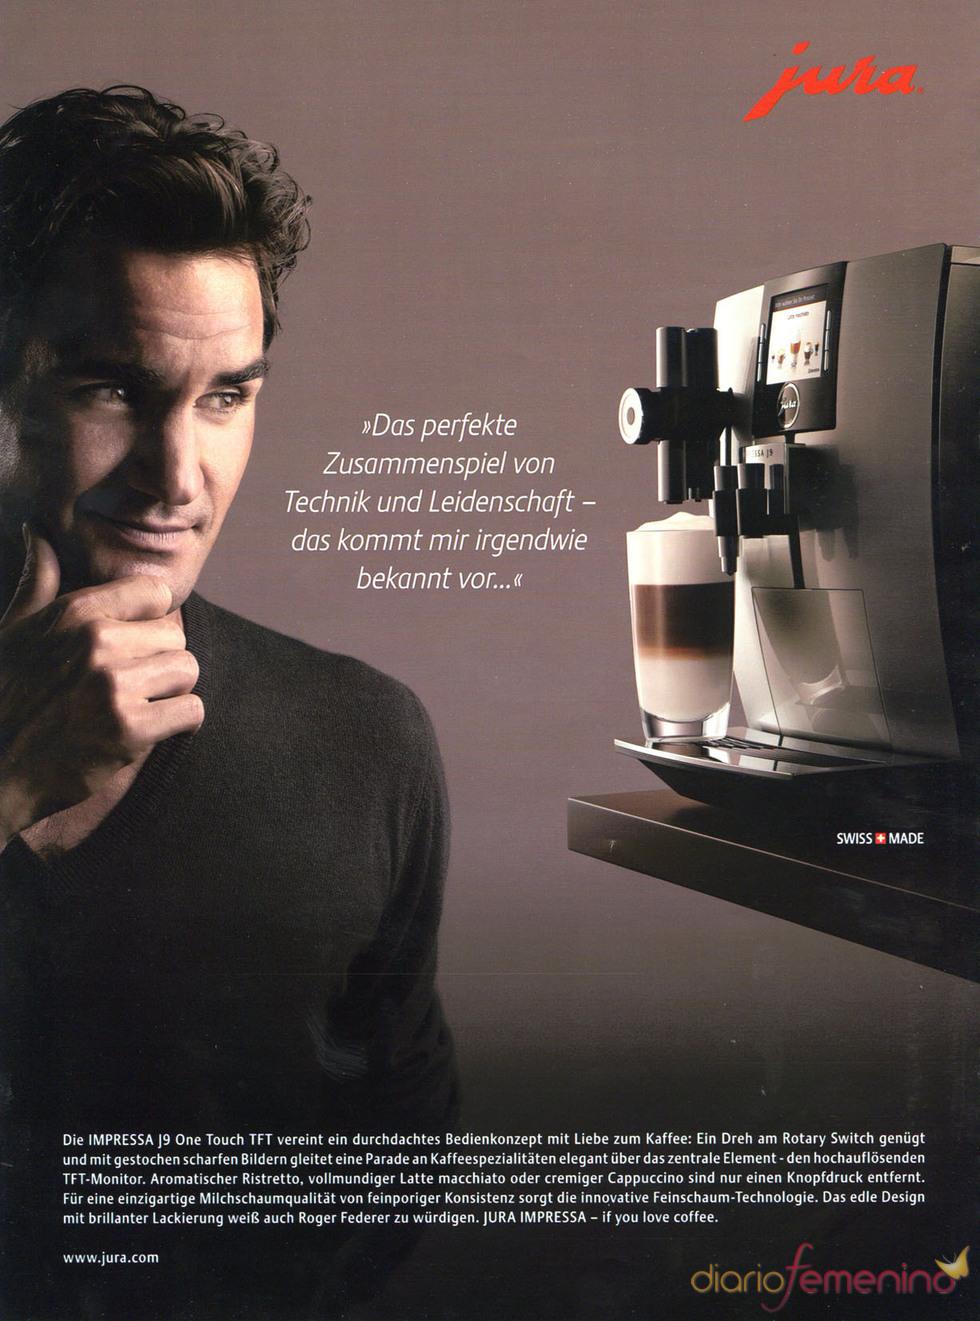 Roger Federer, imagen de Jura coffee